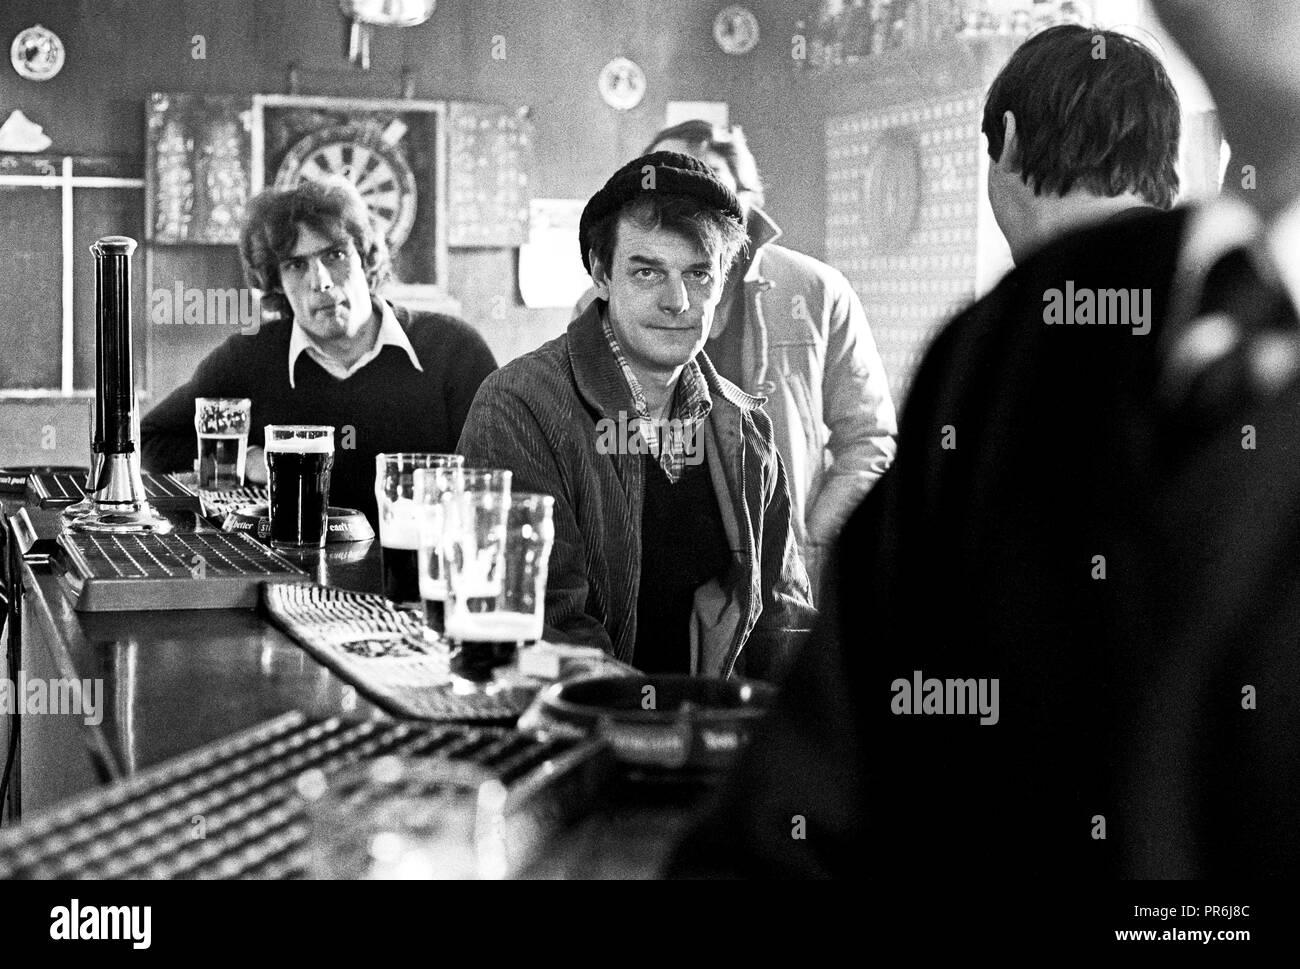 Working class men drinking in pub, Shildon, Durham, 1986 - Stock Image